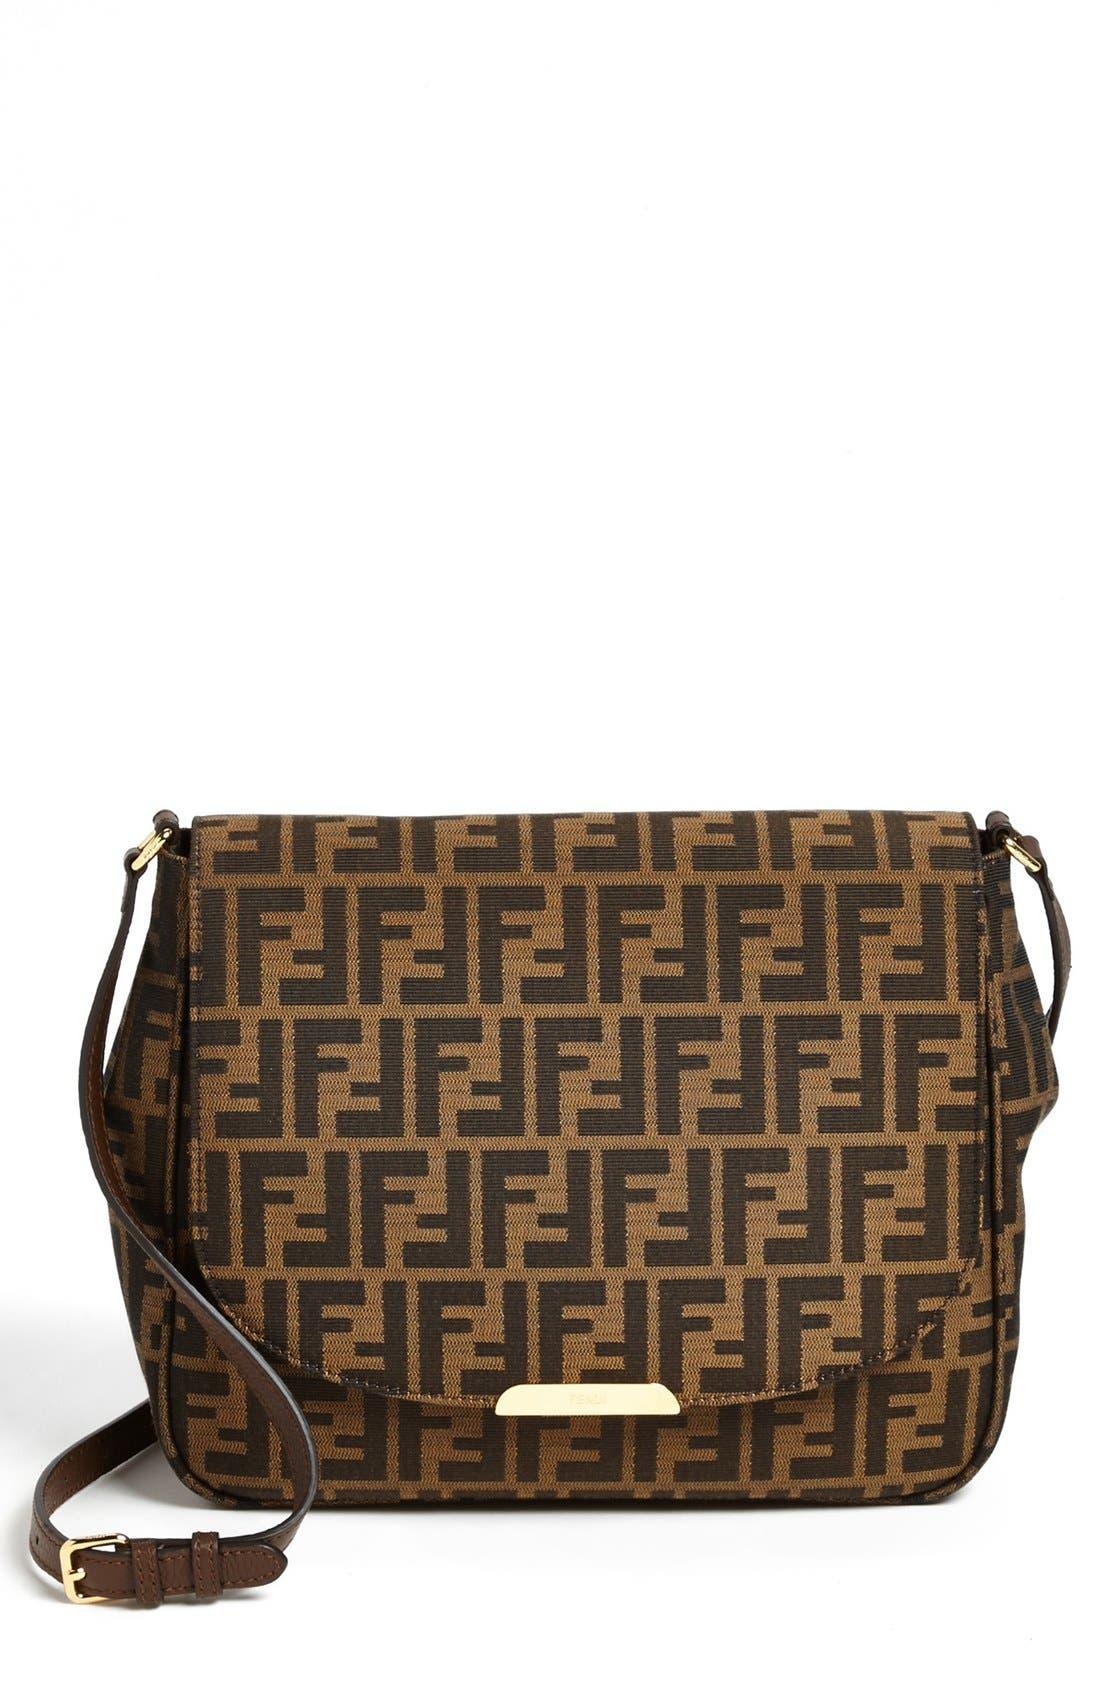 Alternate Image 1 Selected - Fendi 'Zucca - Large' Logo Jacquard Crossbody Bag